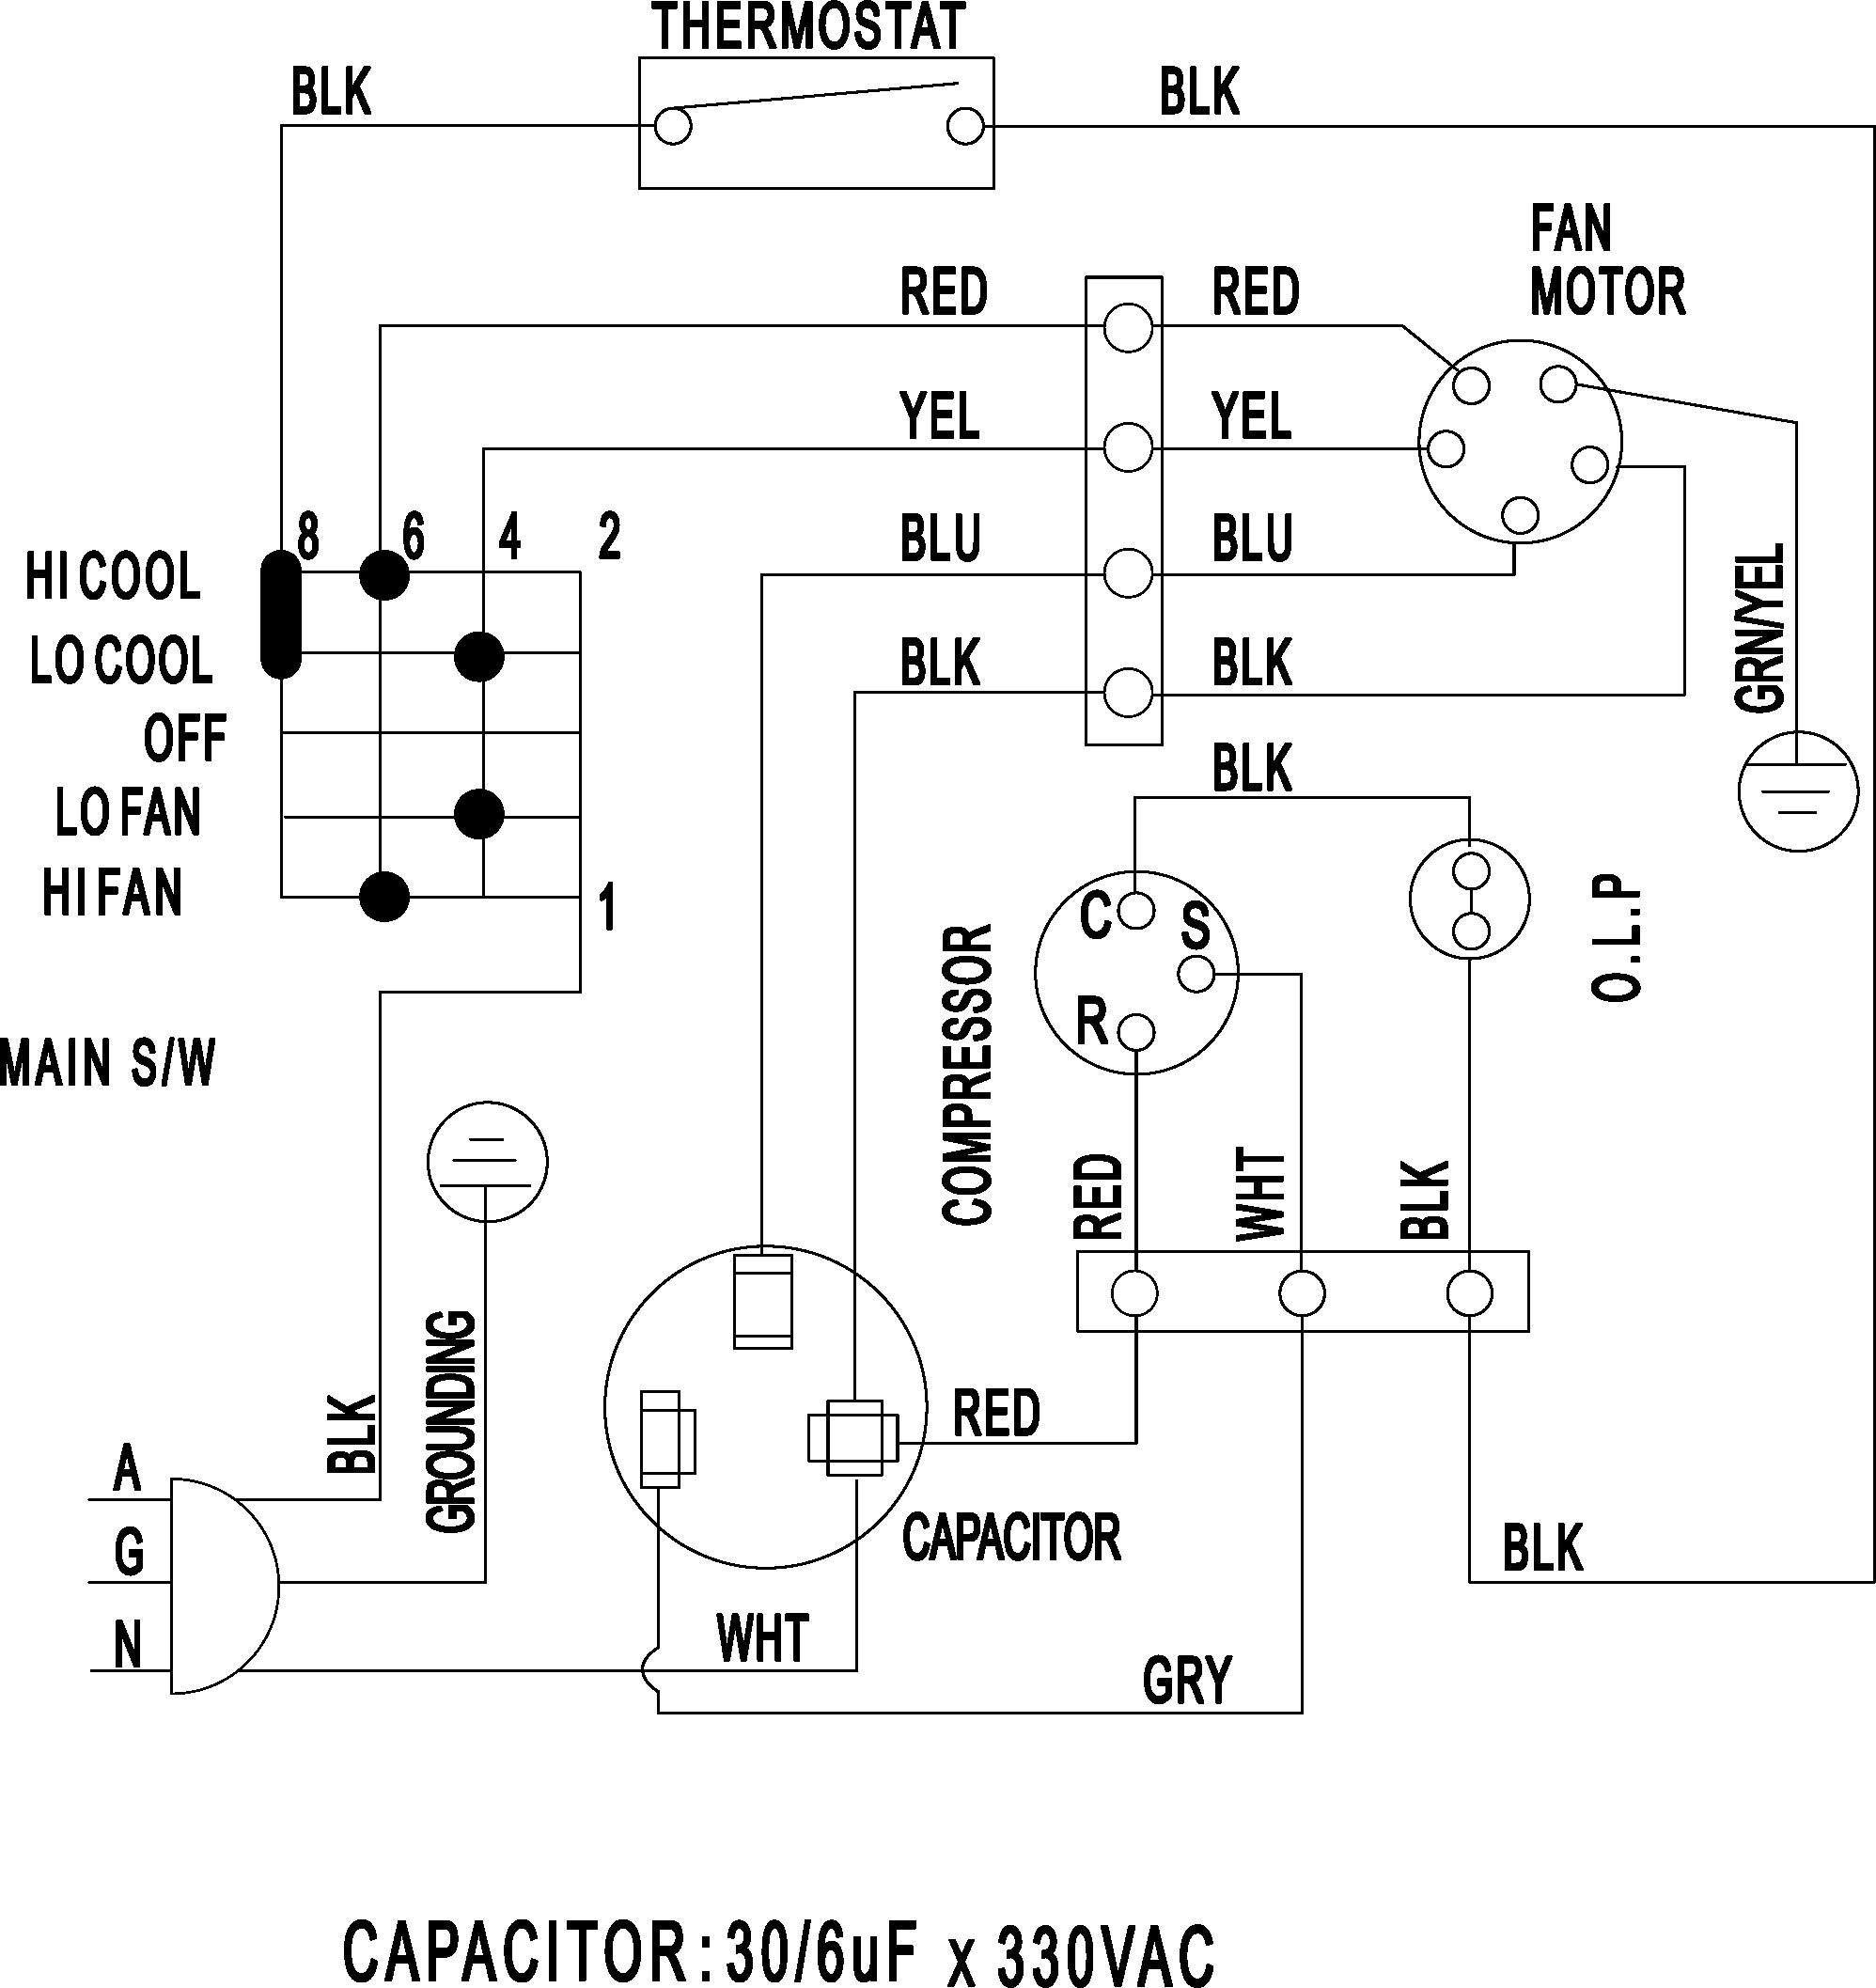 Ac Unit Wiring   Wiring Diagram - Ac Condenser Wiring Diagram